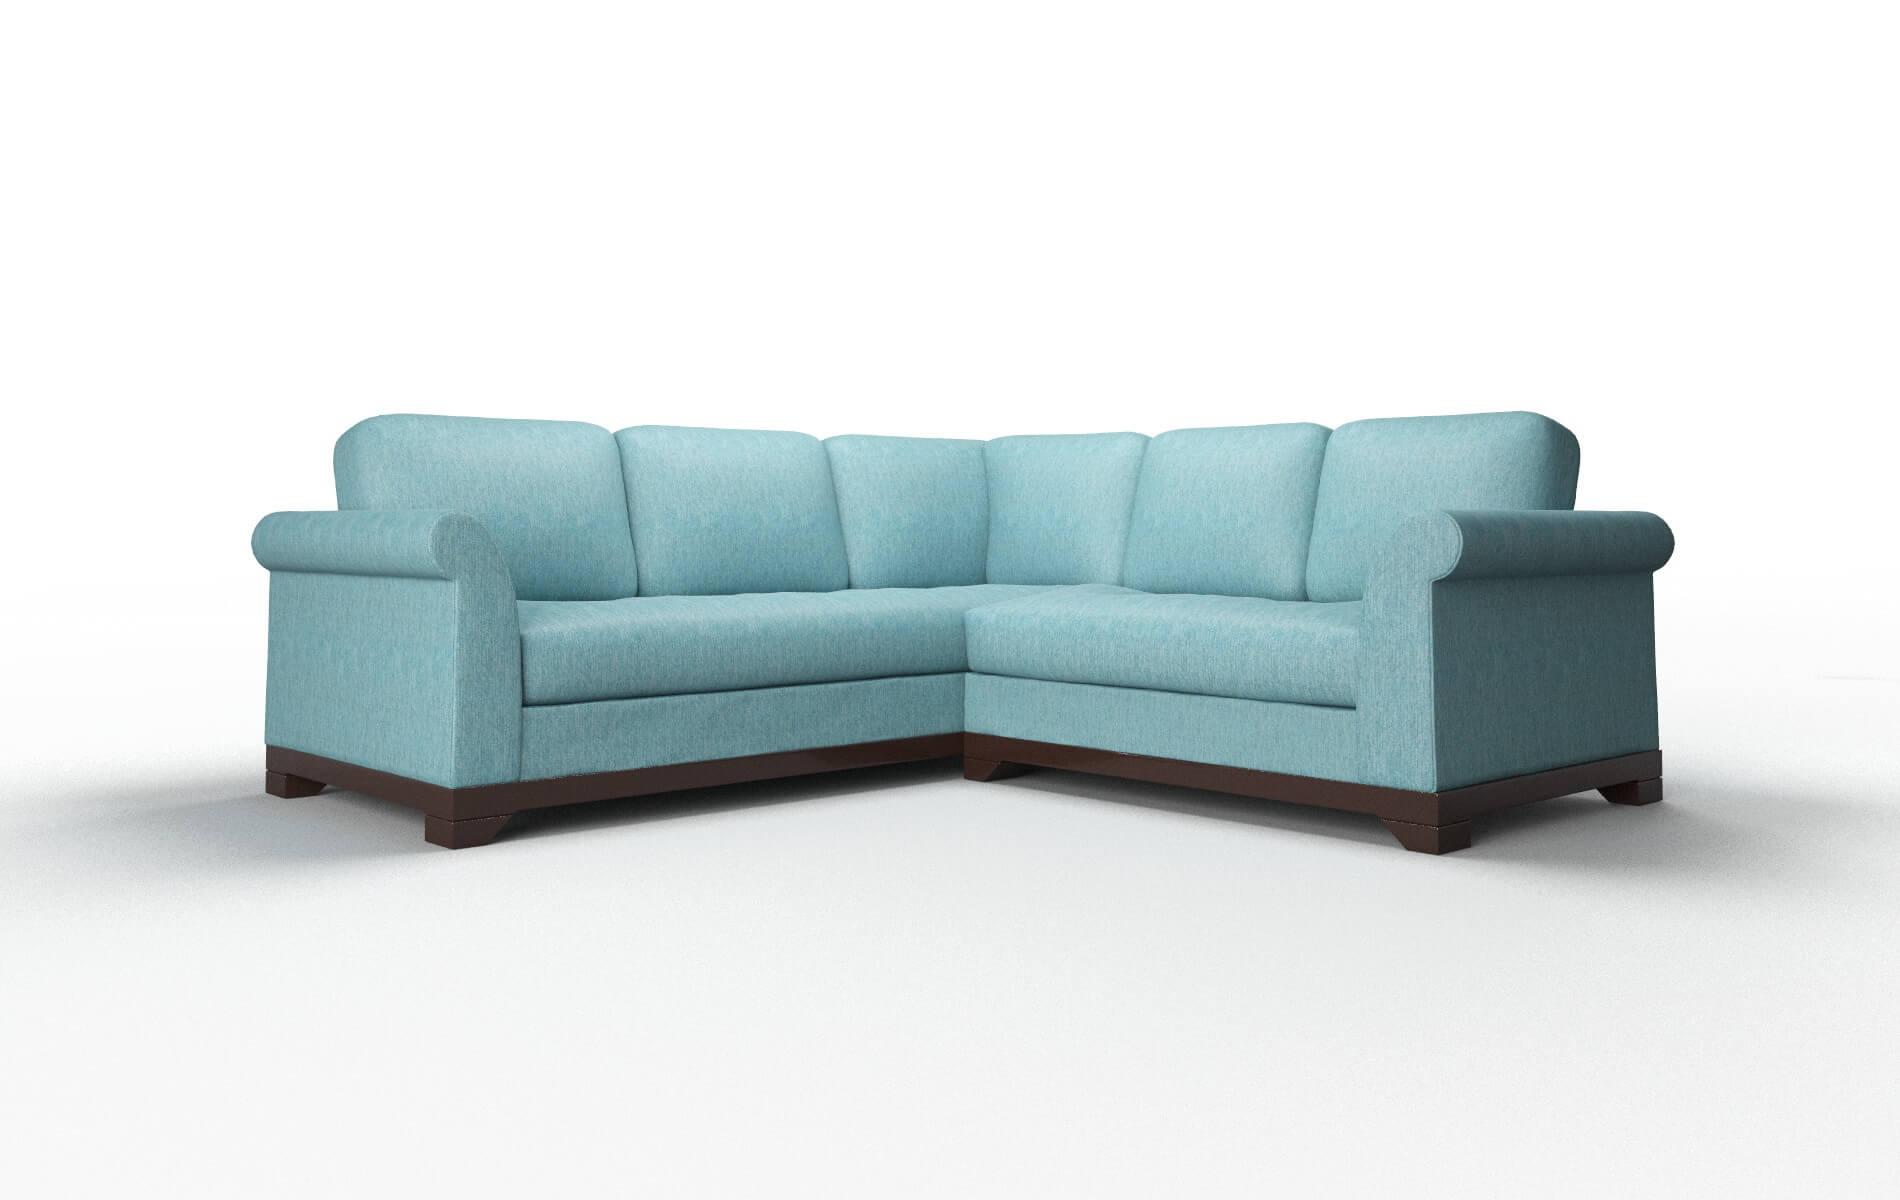 Denver Cosmo Turquoise Sectional espresso legs 1